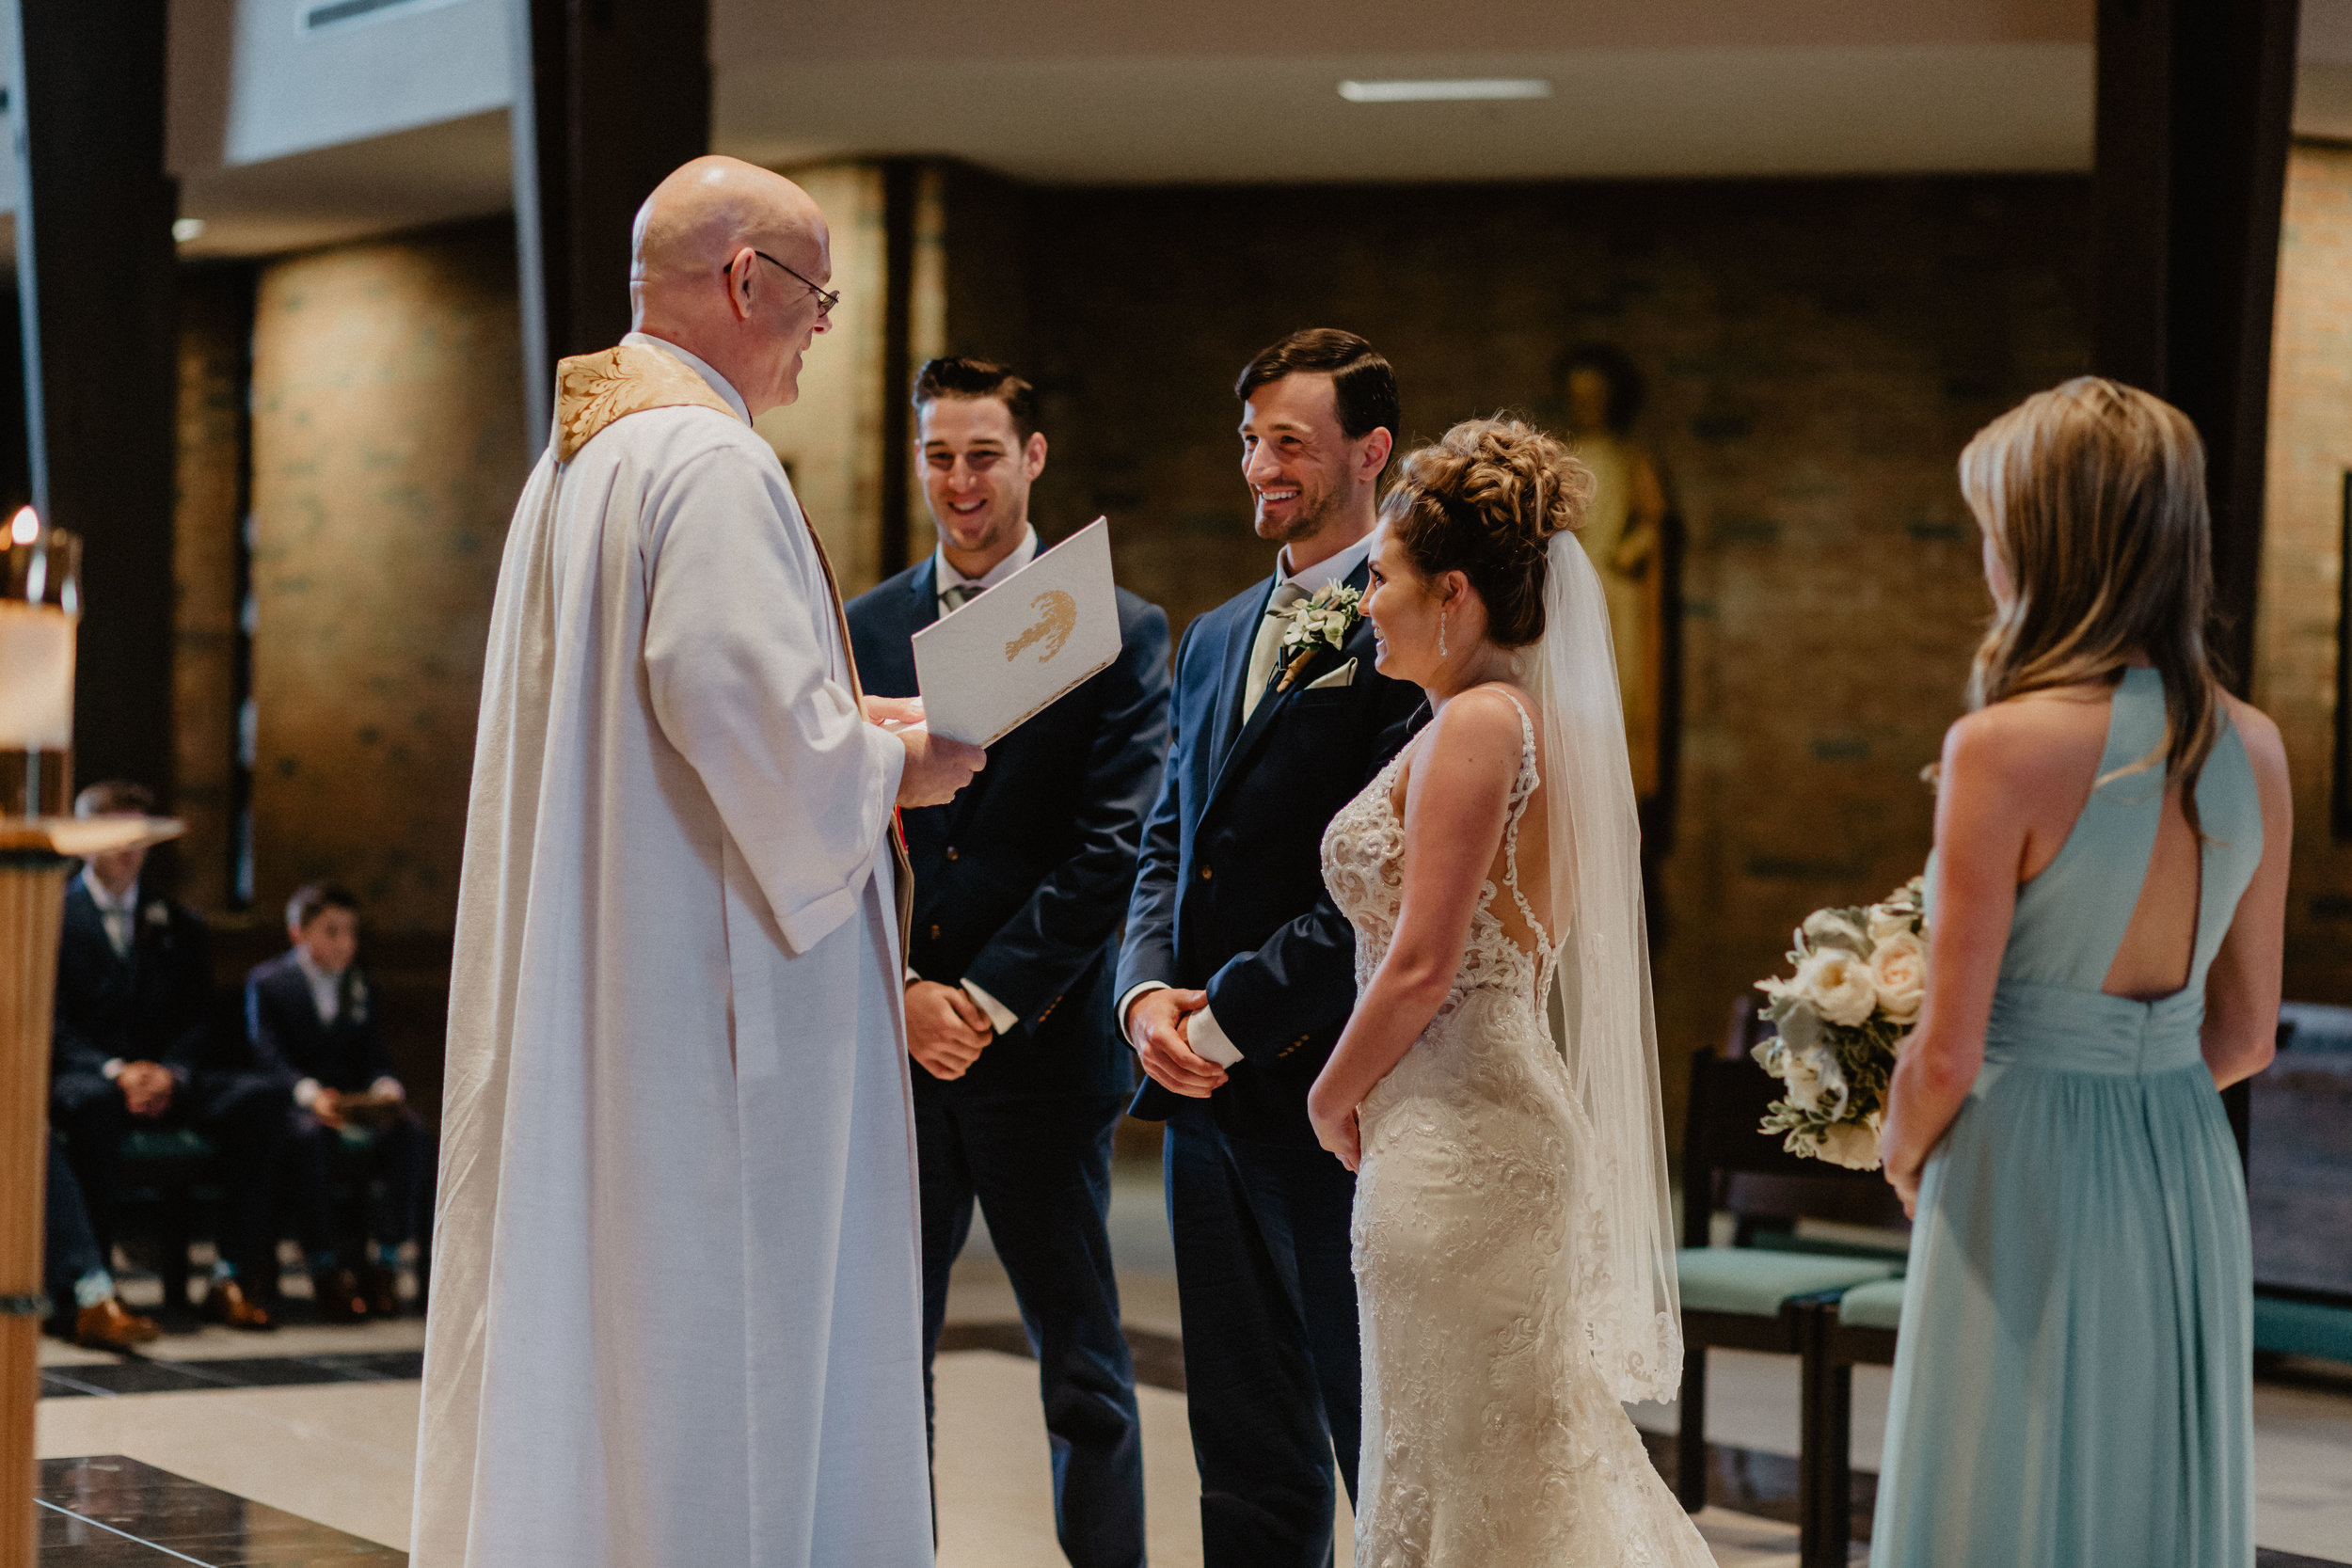 old_daley_on_crooked_lake_wedding_-46.jpg